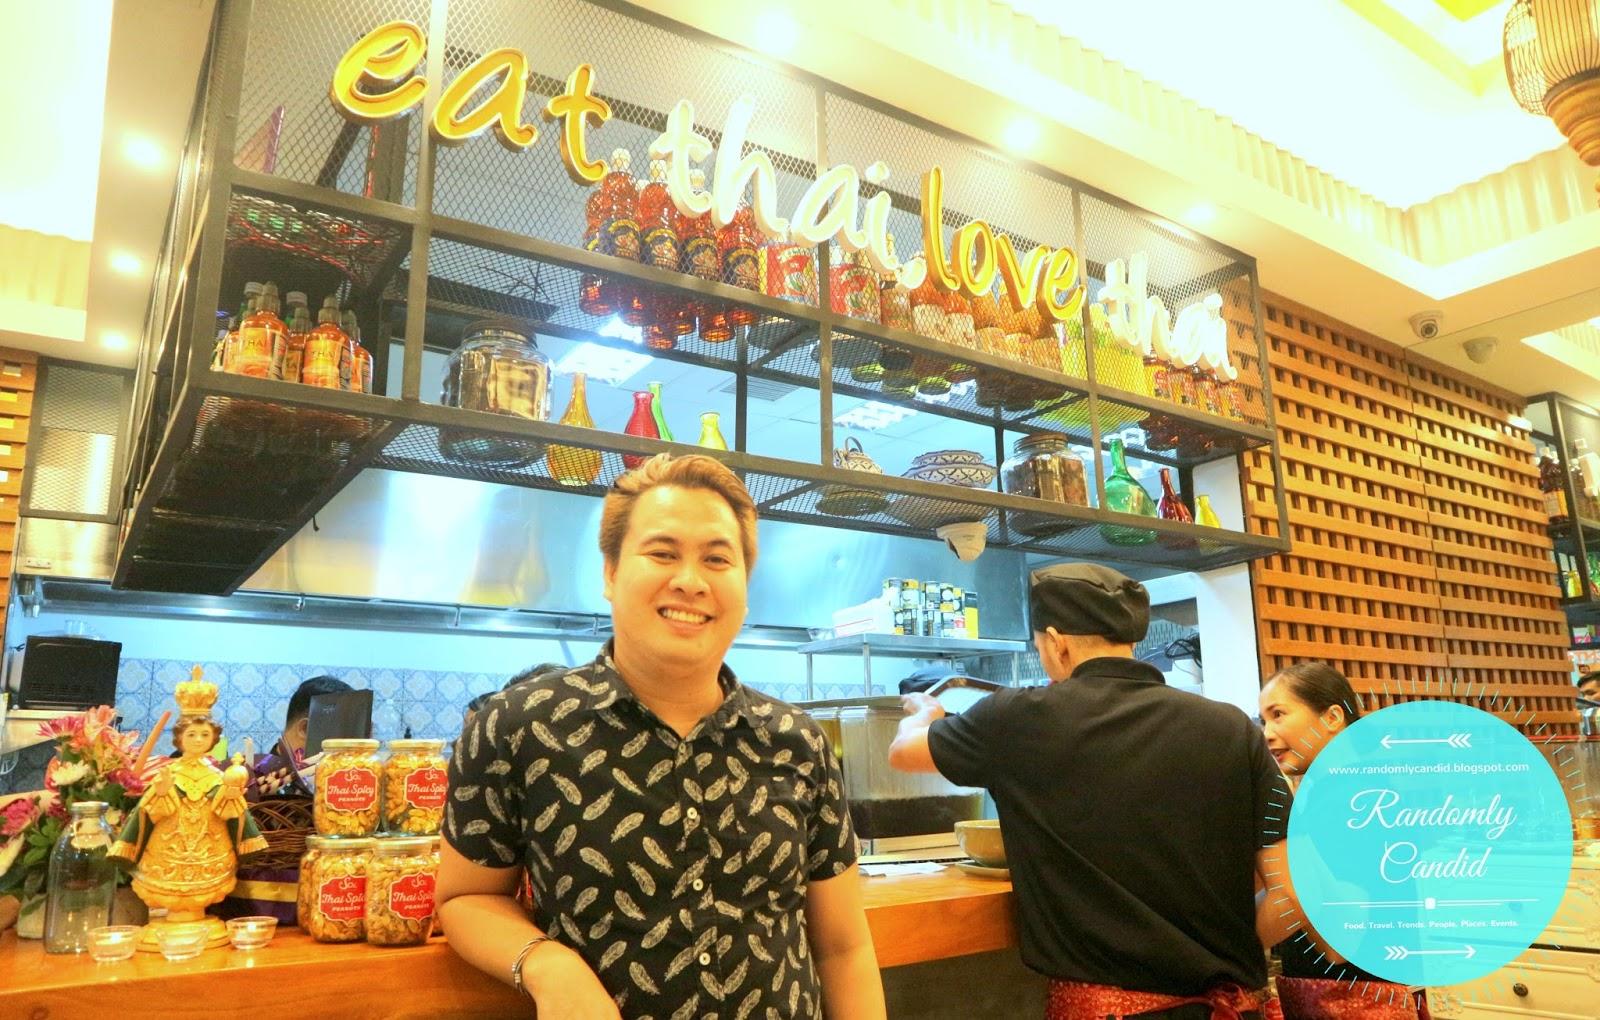 Soi Eat Thai, Love Thai opens at SM City Iloilo | Randomly Candid